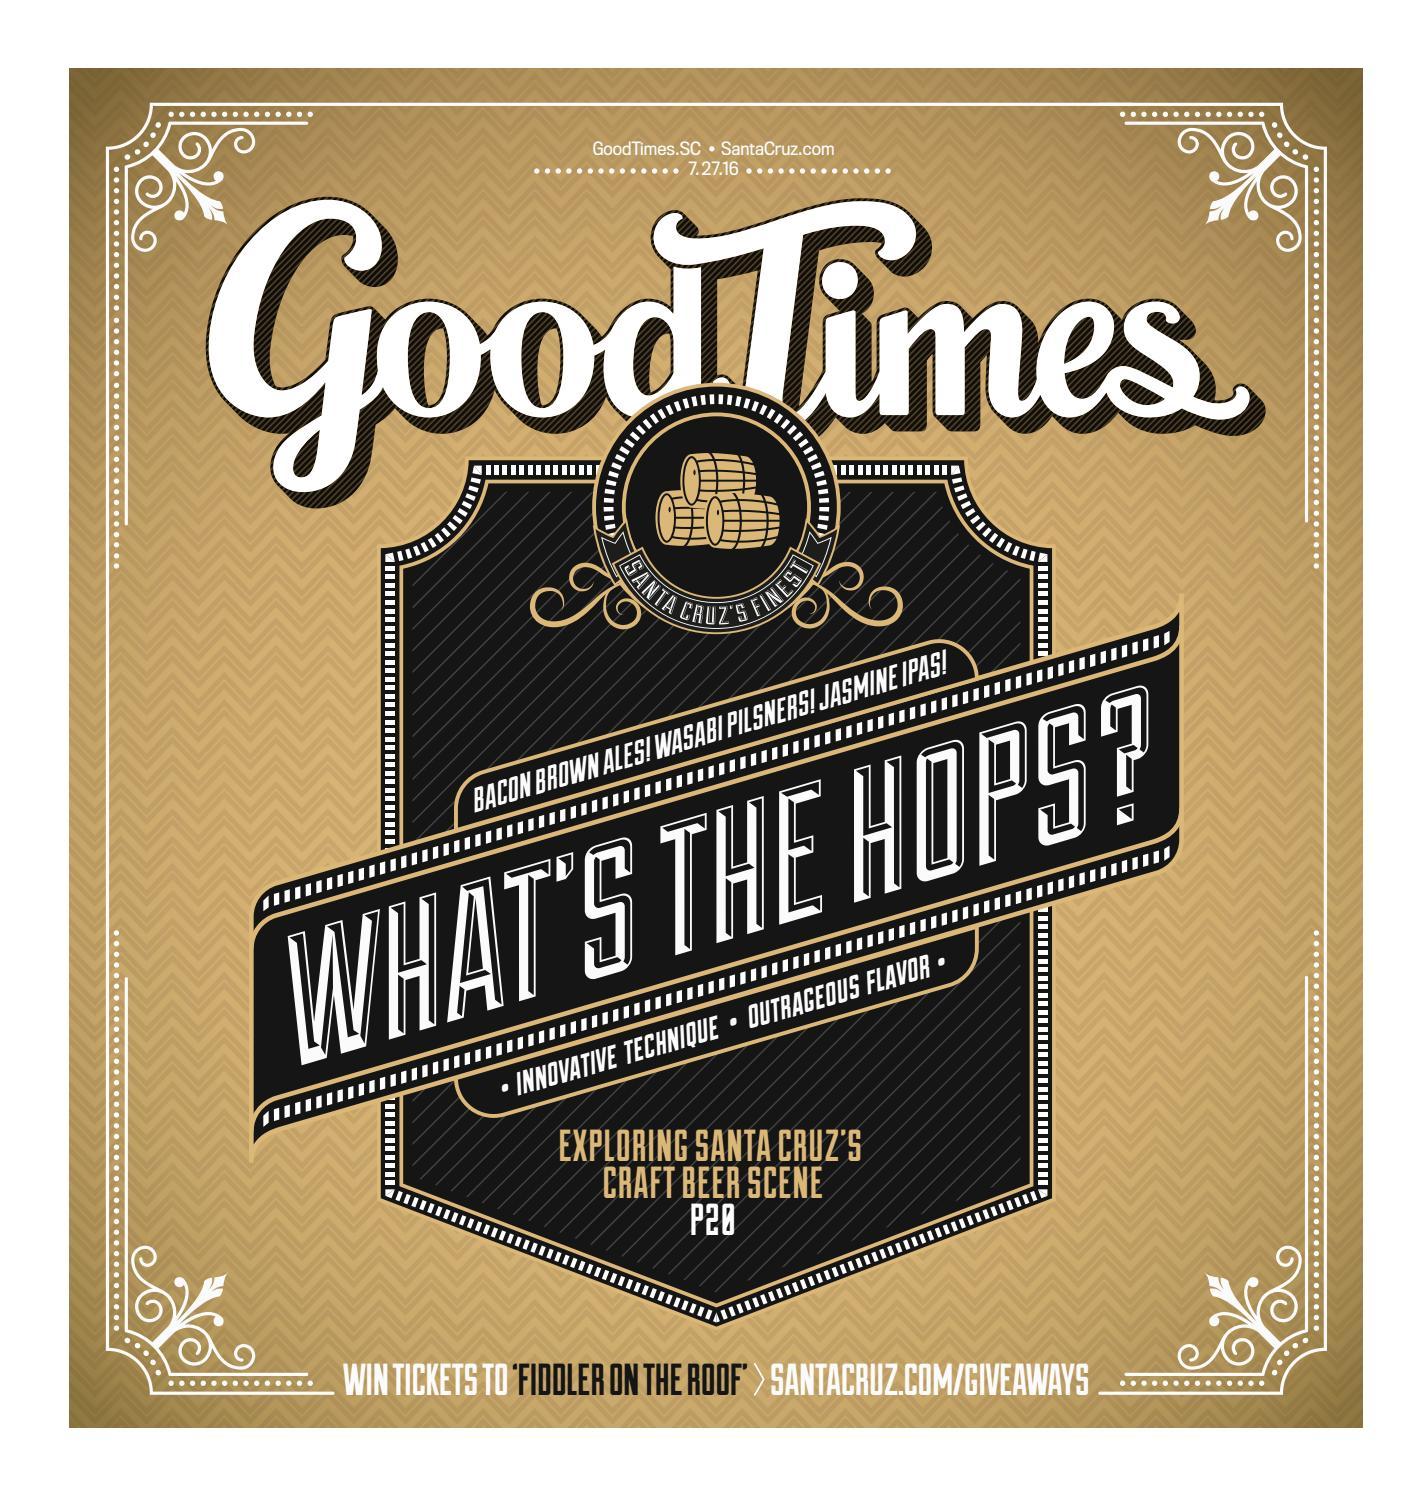 6c62344690c180 Good Times by Metro Publishing - issuu